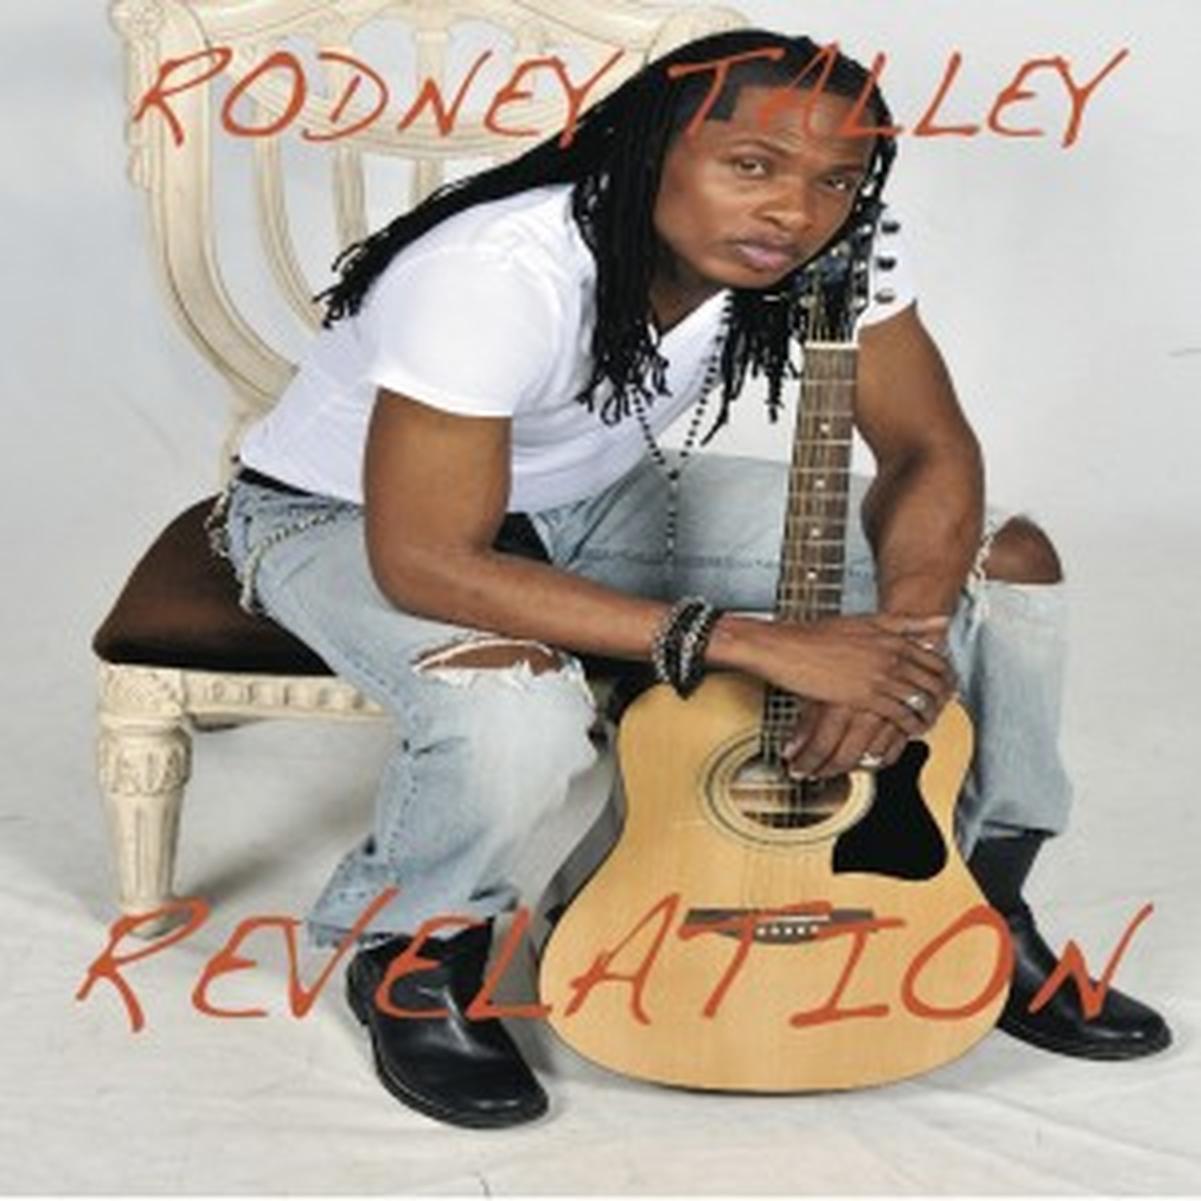 Rodney Talley